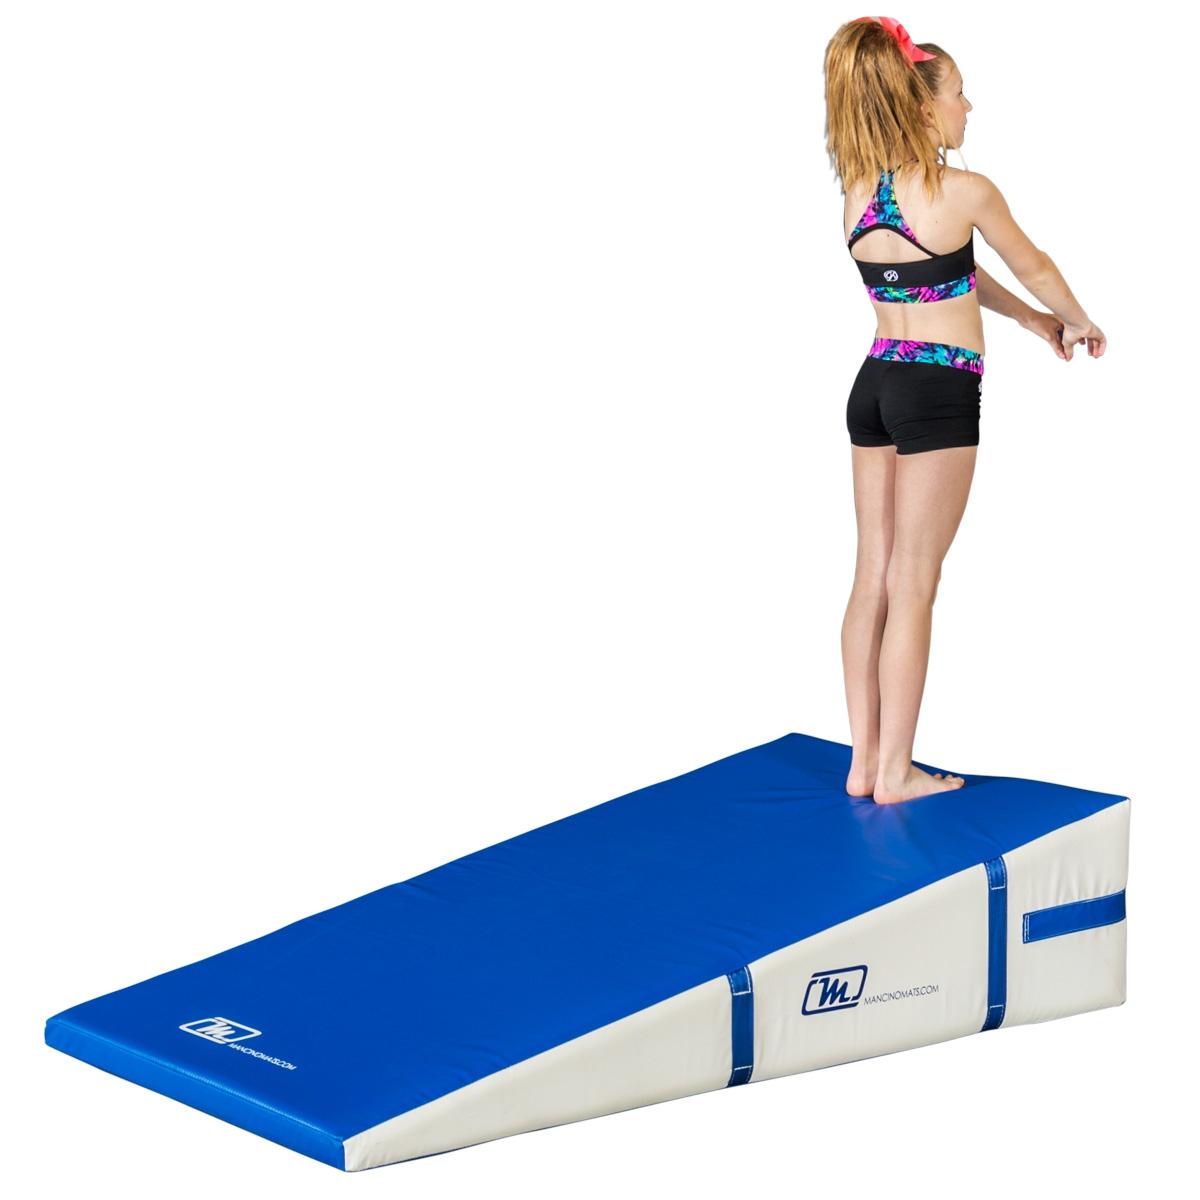 blue cheer incline cheese wedge mats - mancino mats